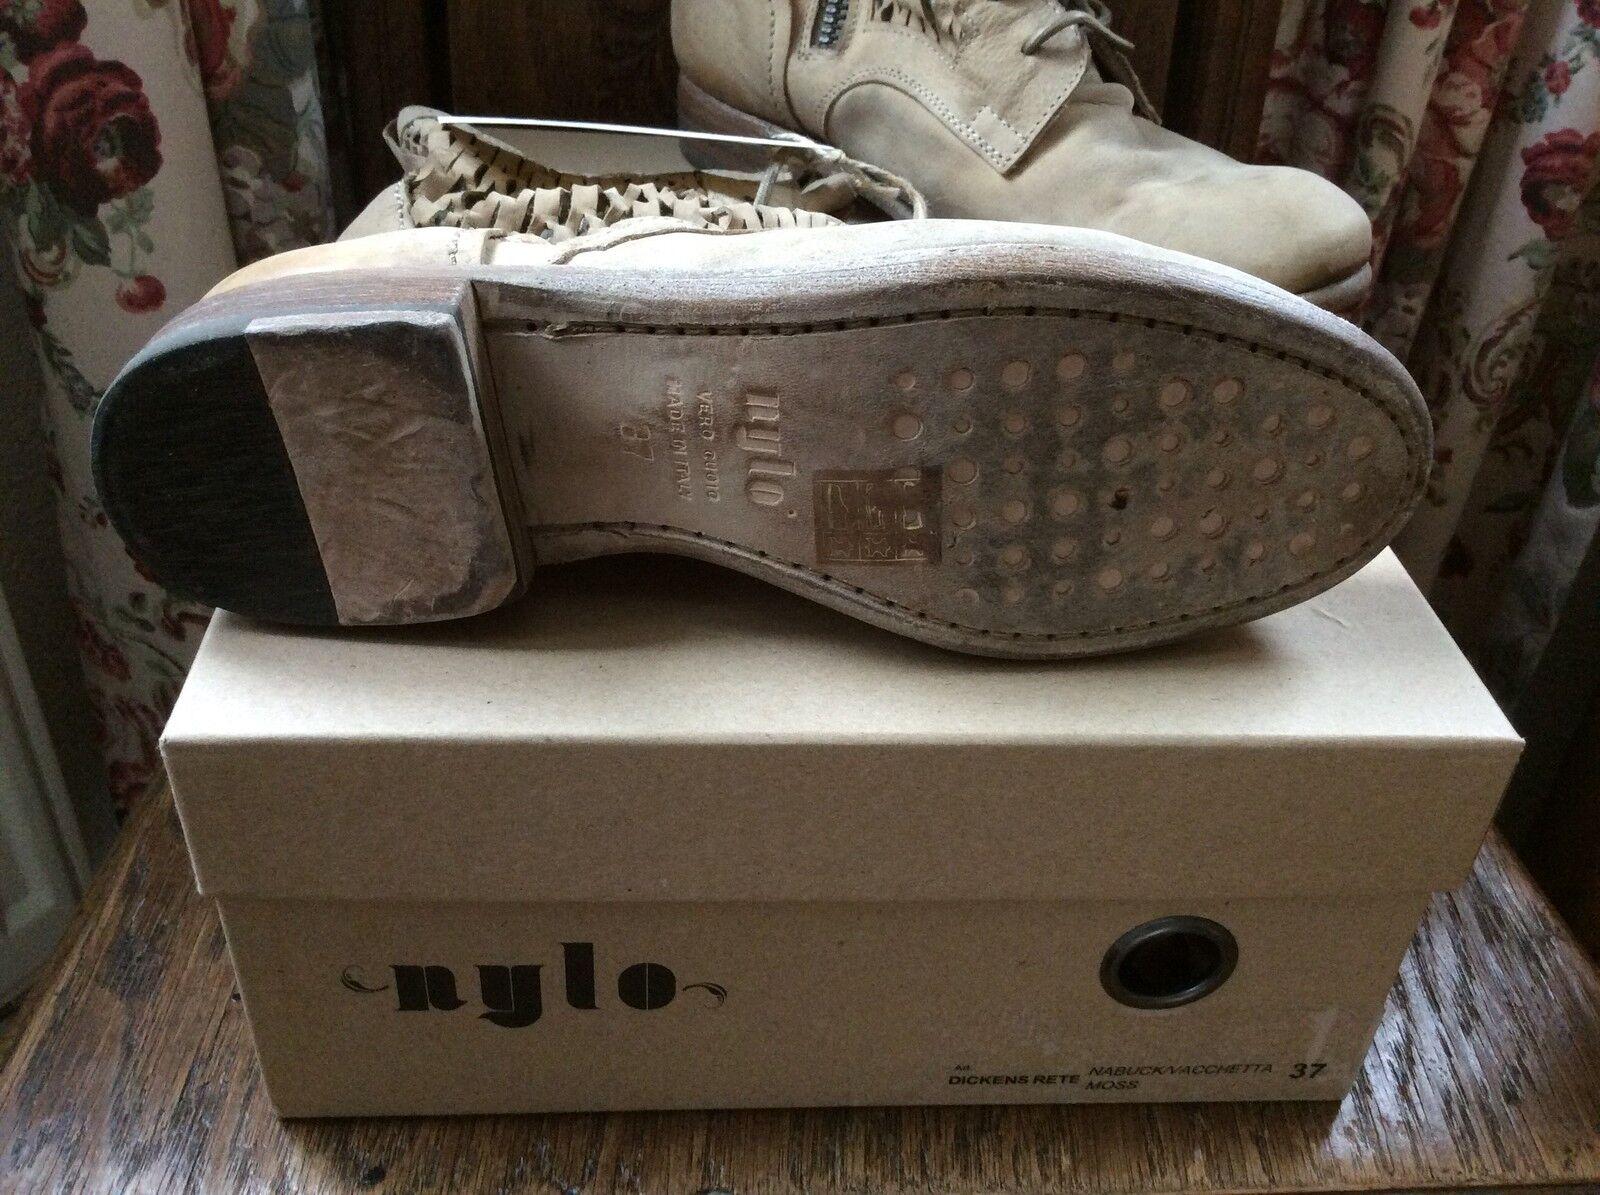 Neu Nylo Stiefel Impressionen Vintage Retro Italien Italien Retro Shabby c42528